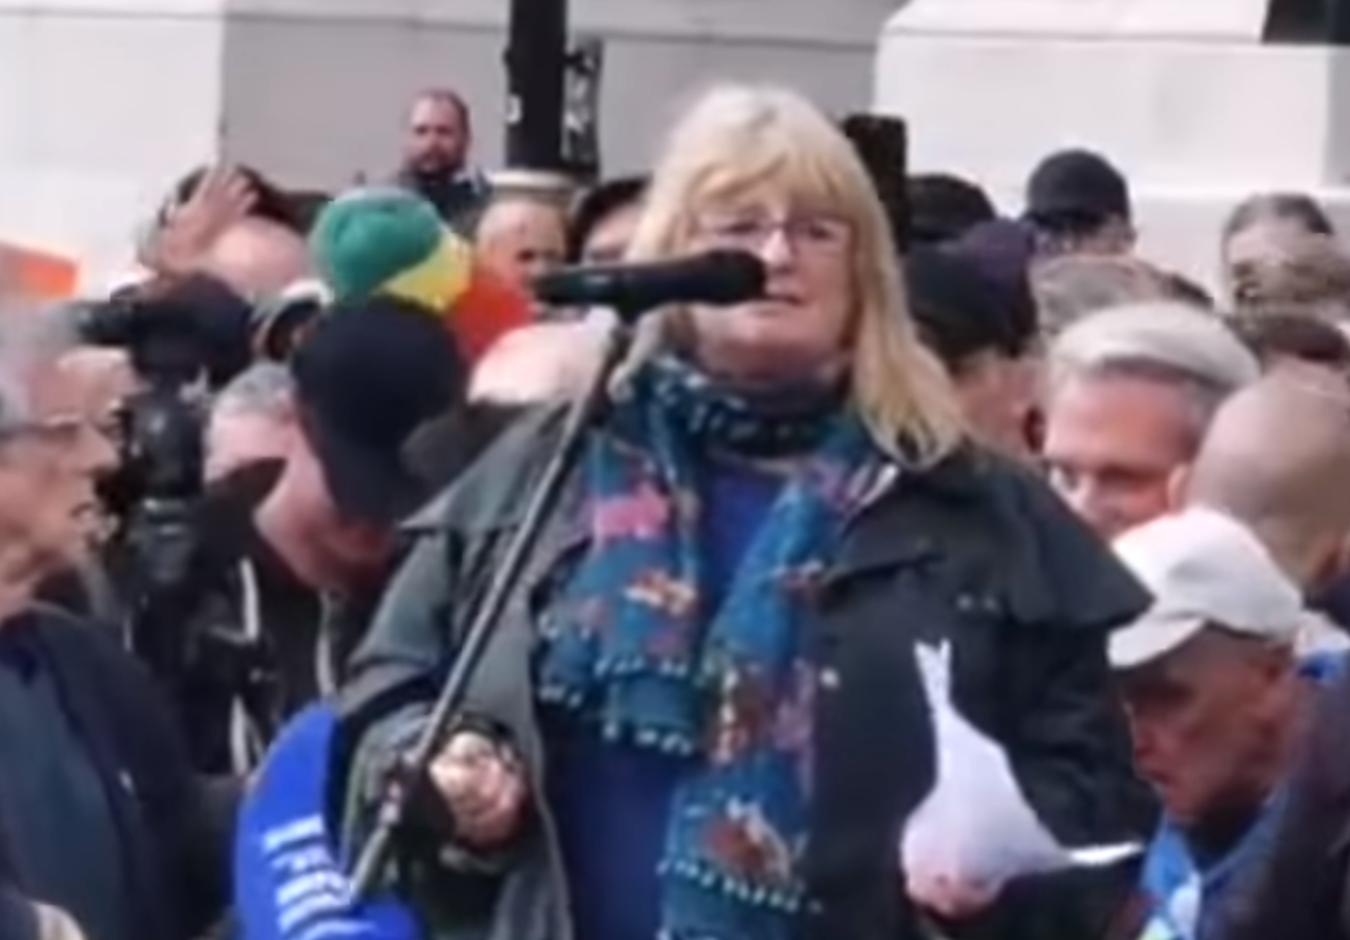 Sandi Adams Trafalgar Square Freedom Protest Sept 2020